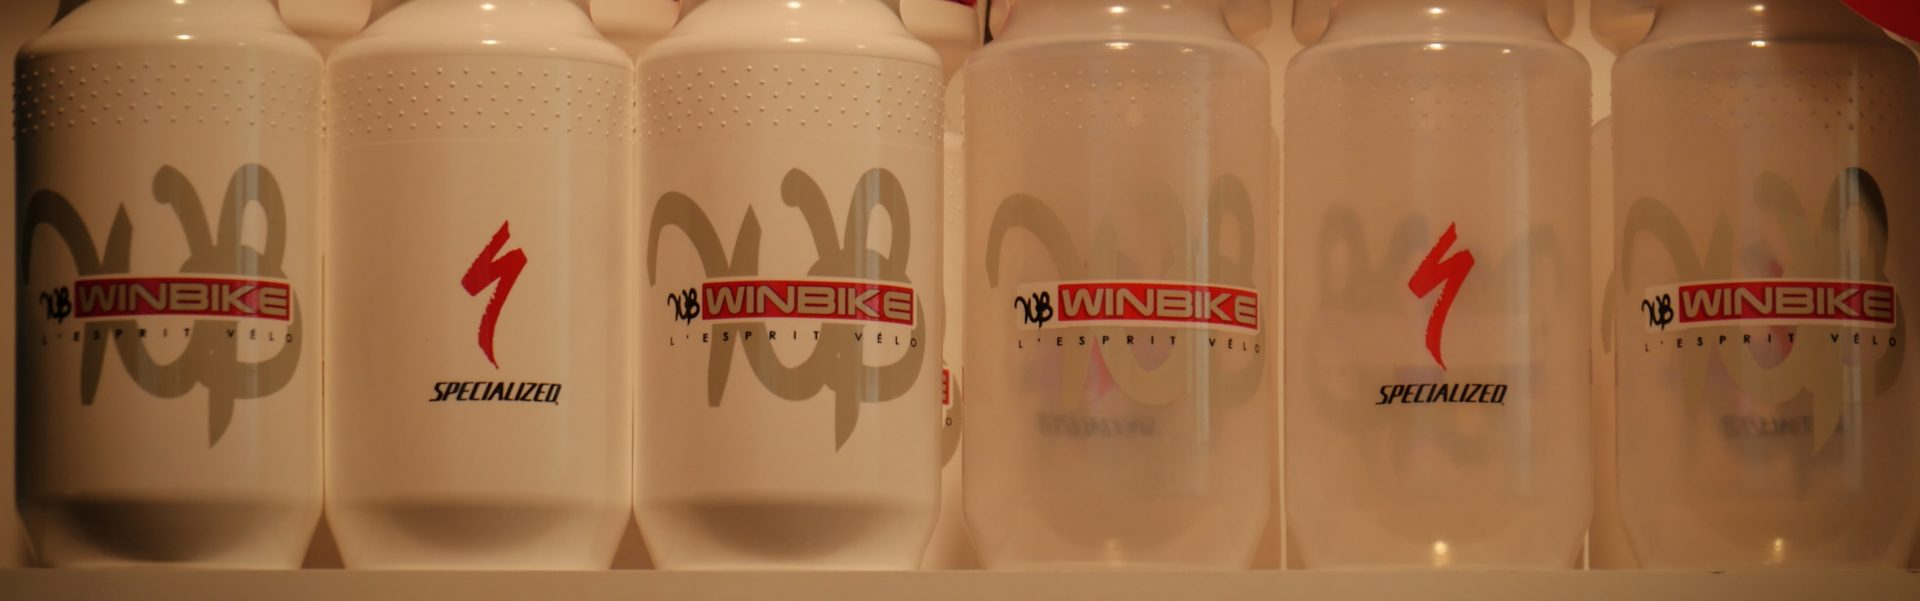 Winbike